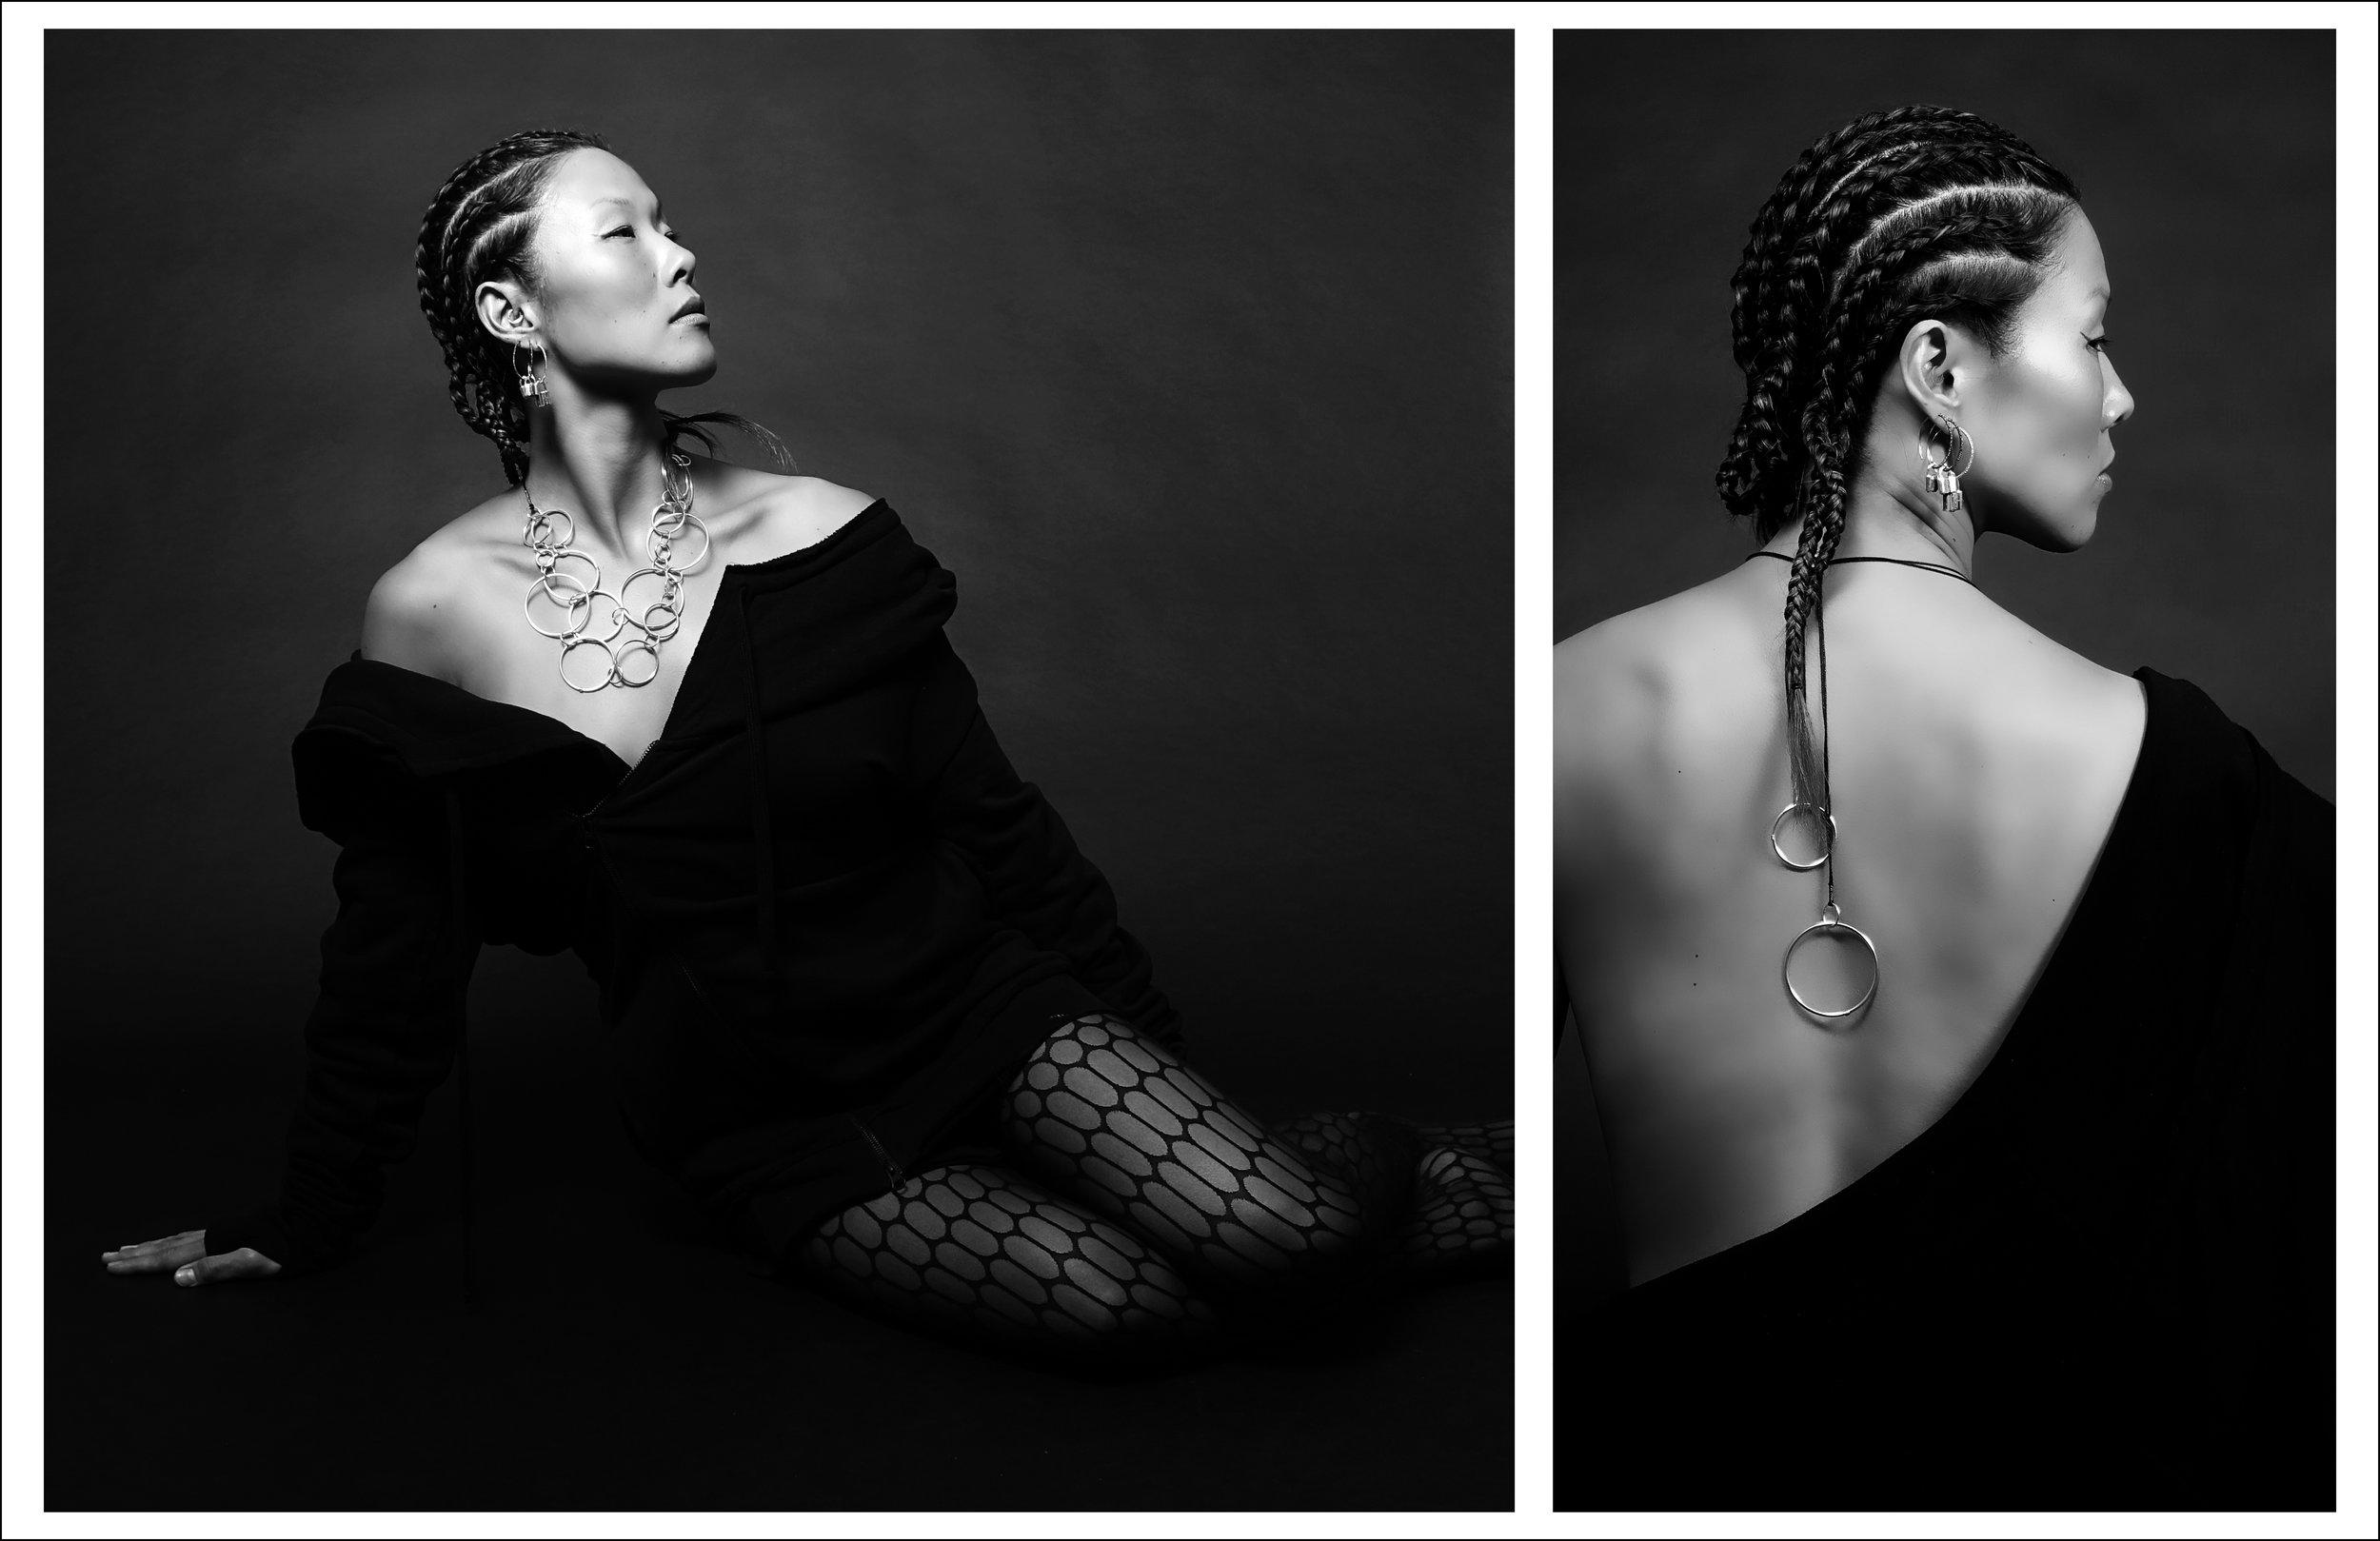 Models: Riji Suh & Maxmillion  Photography, jewelry, styling, art direction, and design direction: Simon Alcantara Post Production: Max Rosario  Hair: Joni Johnson of Kropps and Bobbers Salon